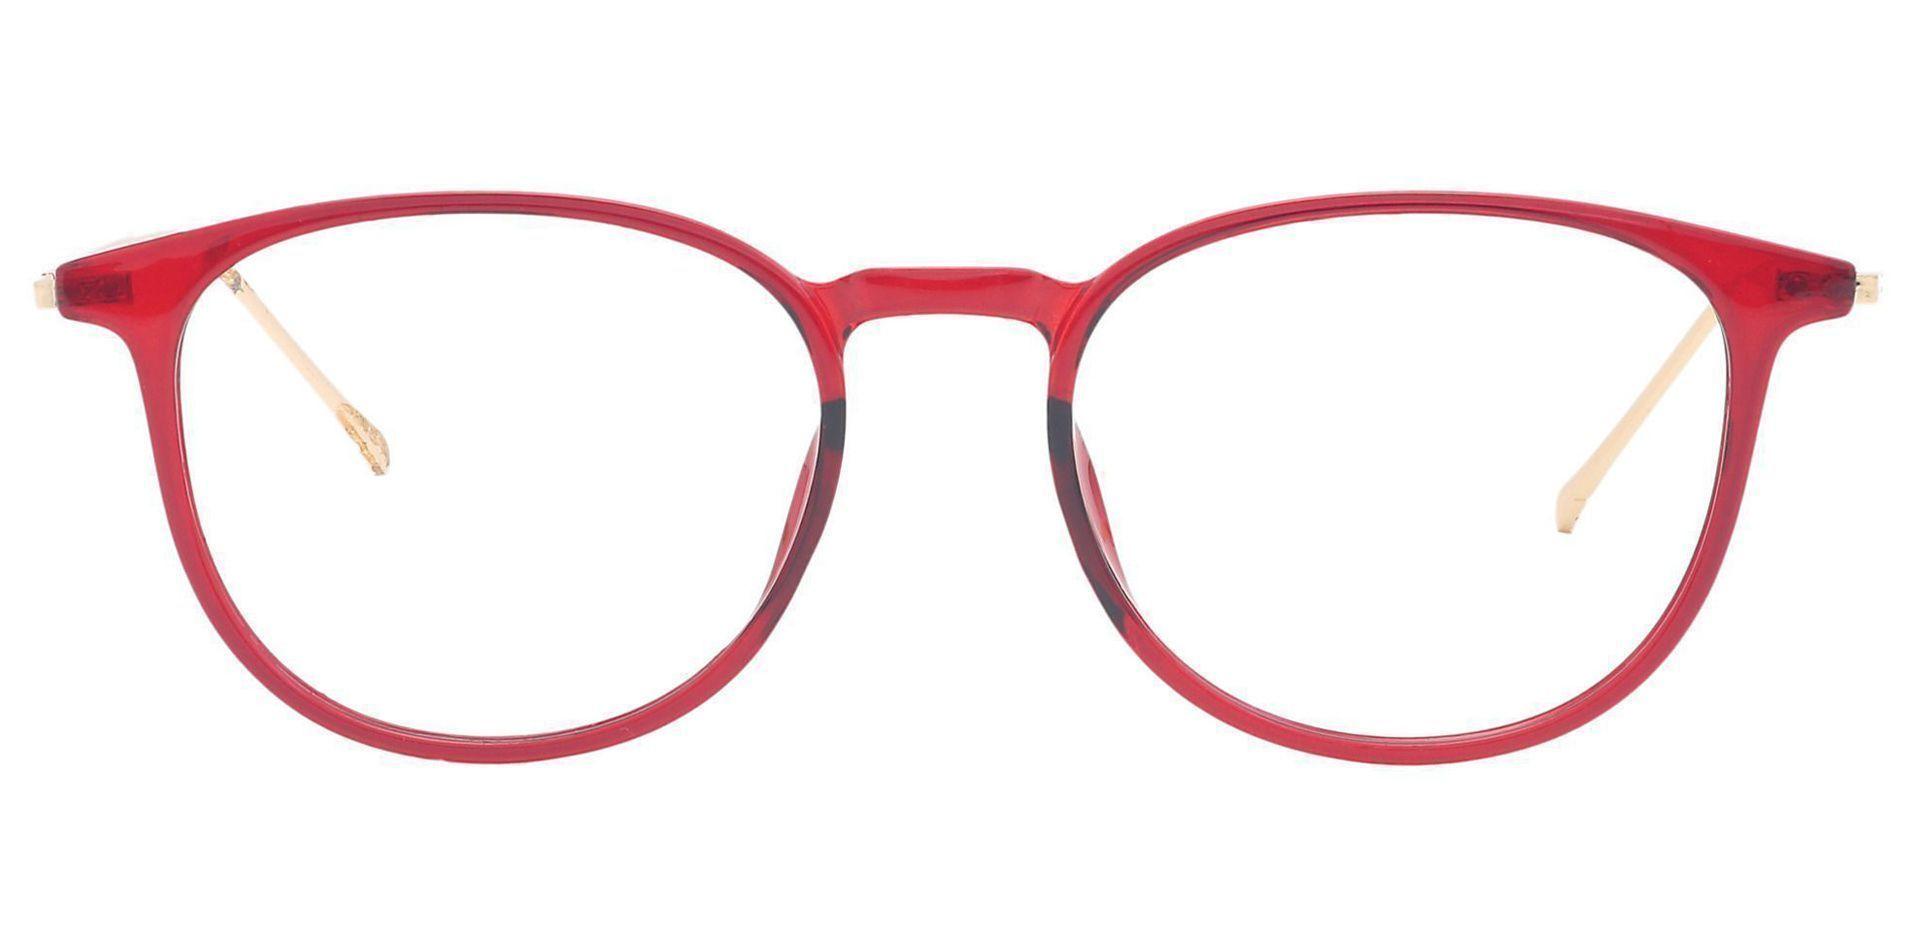 Elliott Round Prescription Glasses - Red